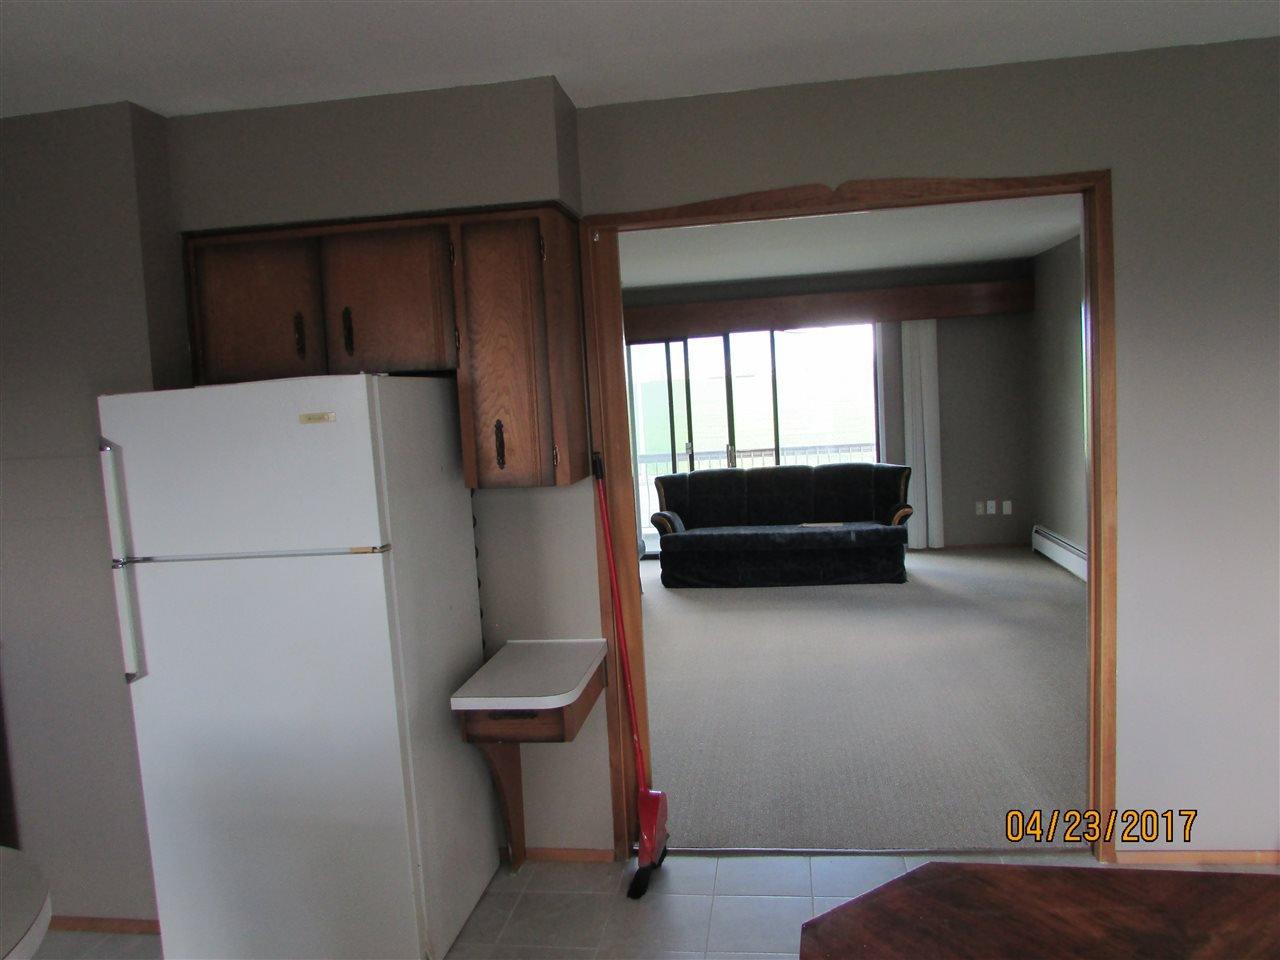 Photo 11: Photos: 7220 EVANS Road in Sardis: Sardis West Vedder Rd House for sale : MLS®# R2160379